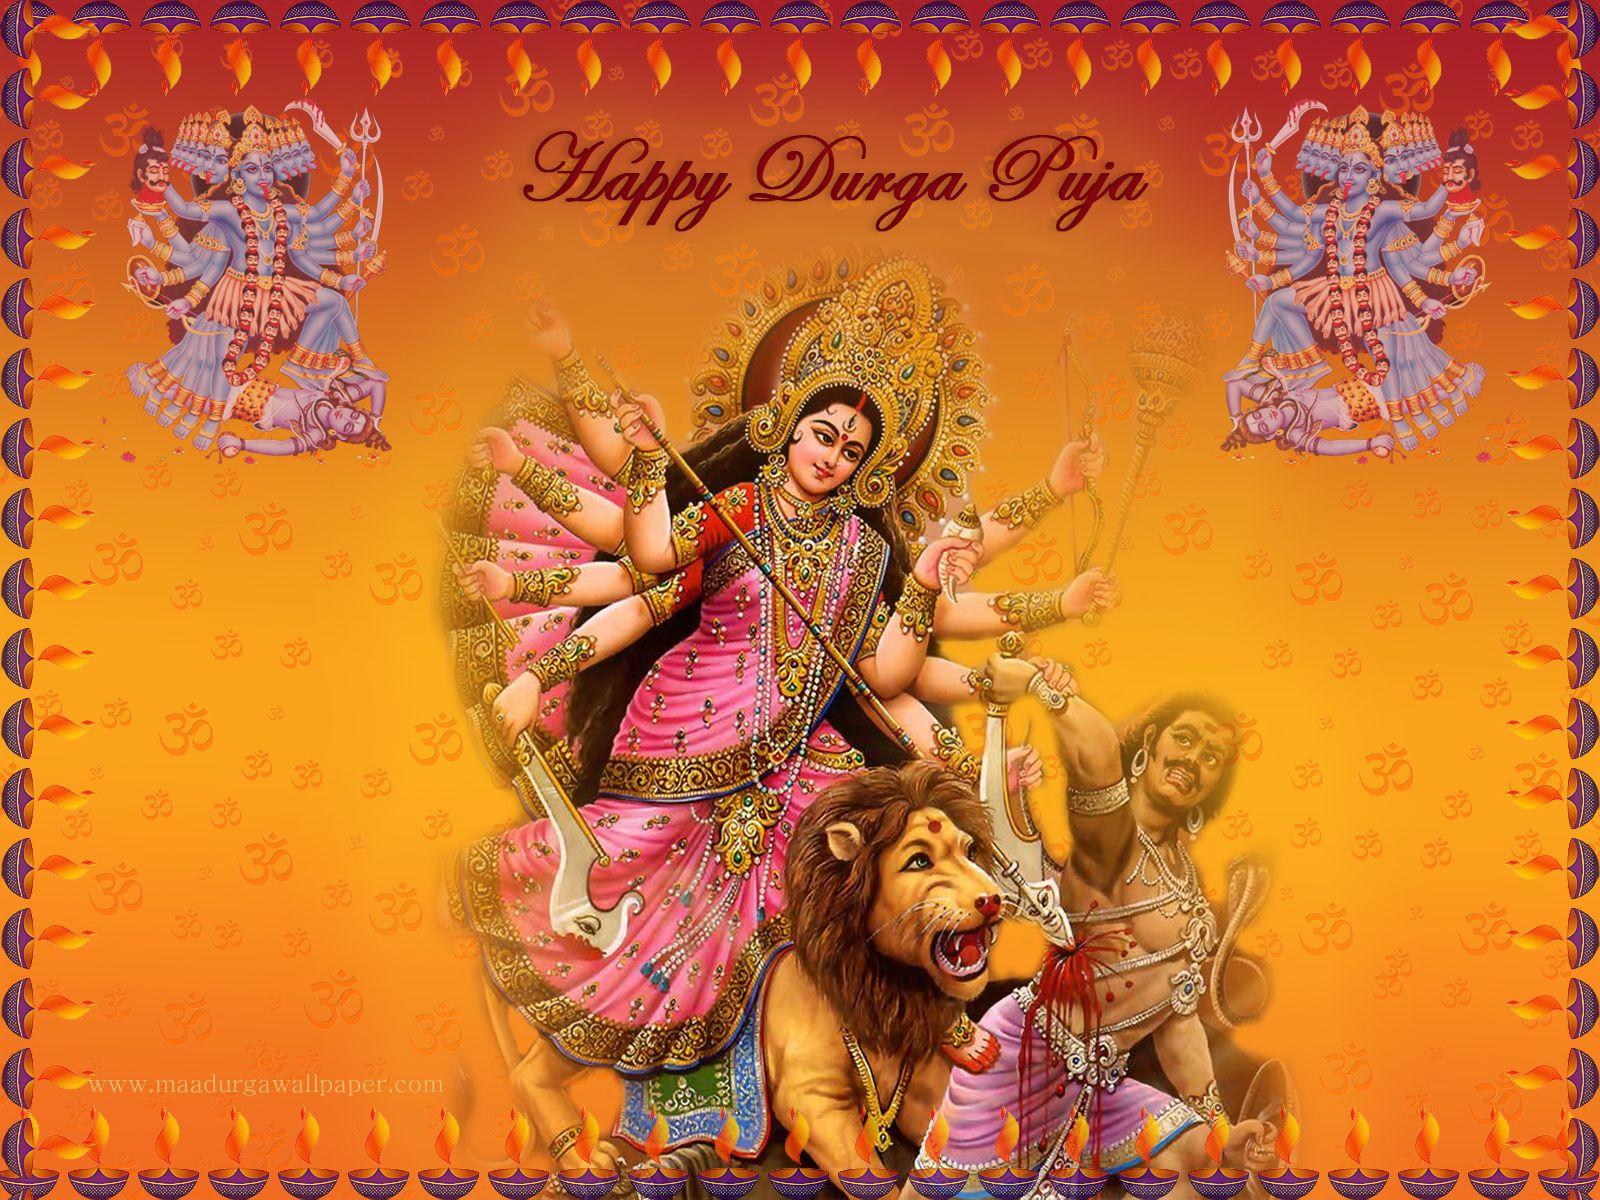 Popular Wallpaper Lord Bhadrakali - 57c85329de5edba1deba30eec475bb8c  Photograph_968286.jpg